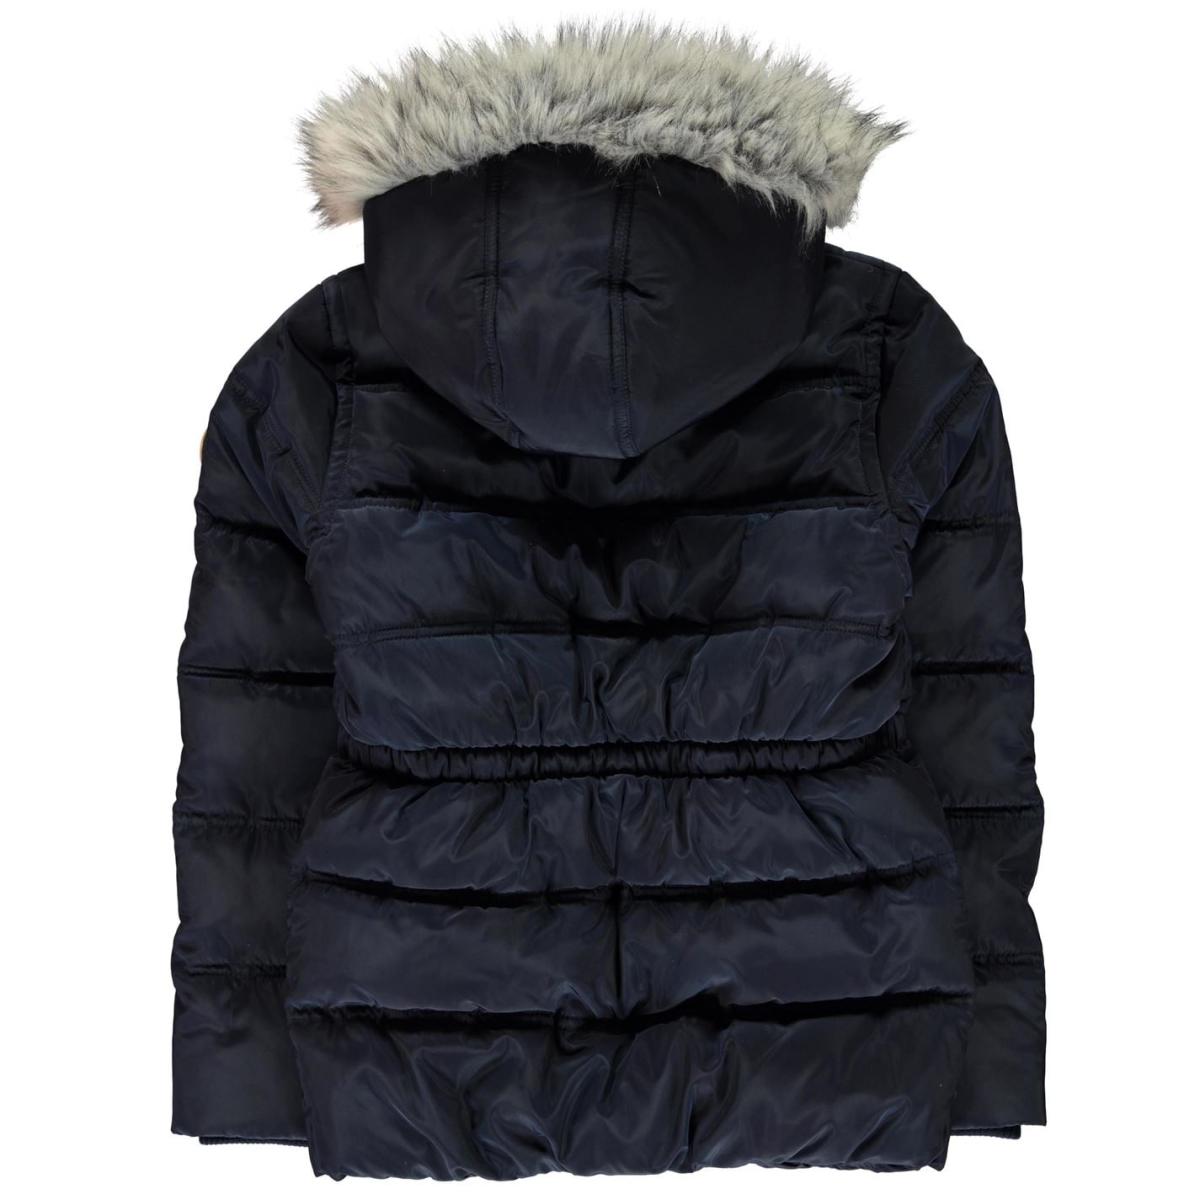 Gelert Winterjacke Kinder Jacke Jungen Storm Parka 8160 Navy